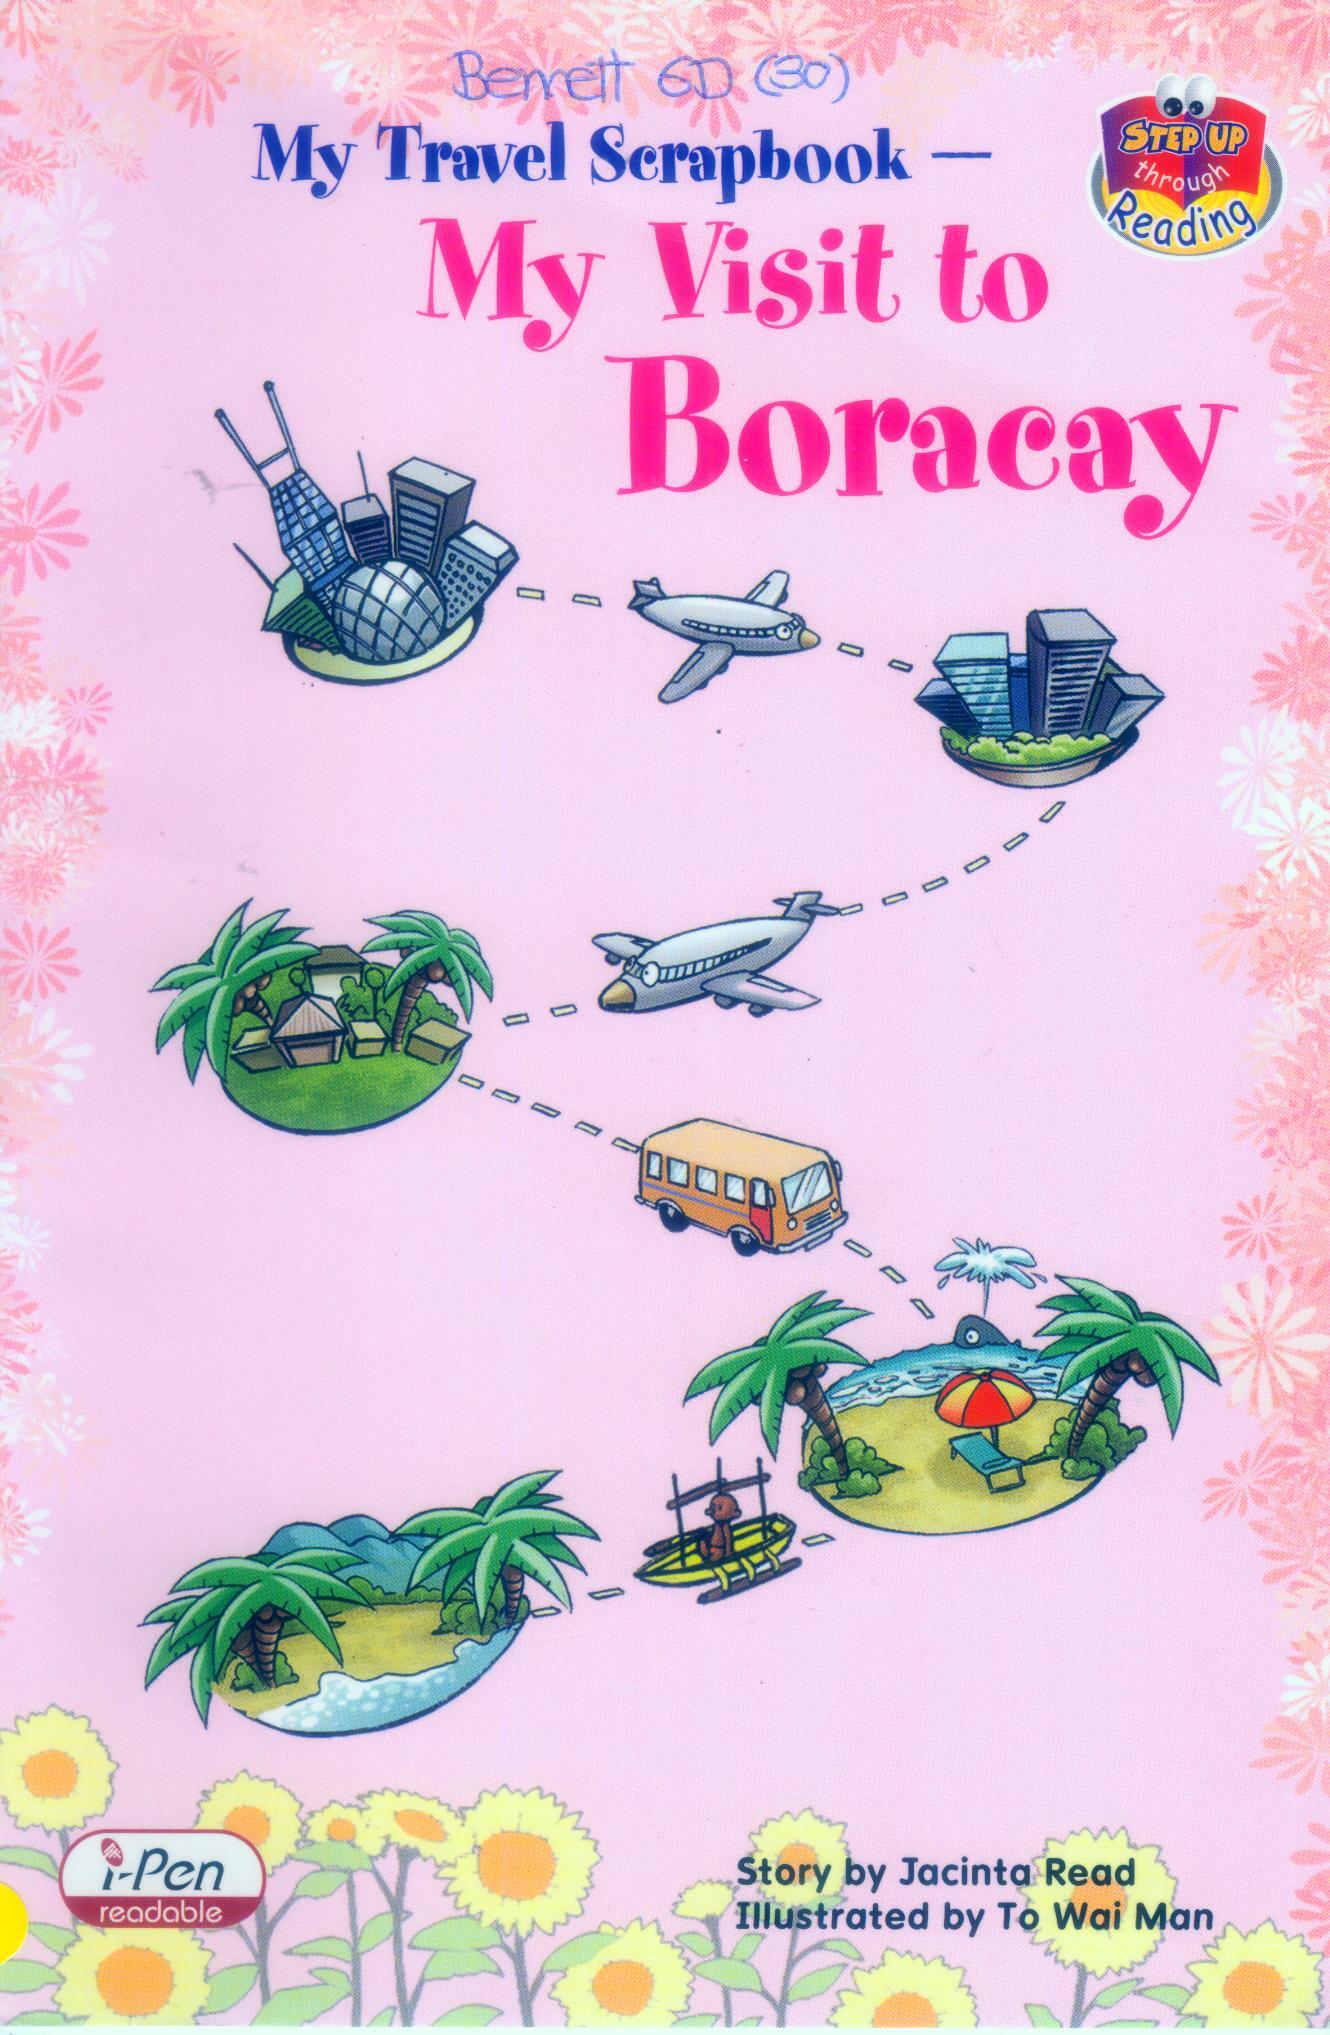 My Travel Scrapbook - My Visit to Boracay